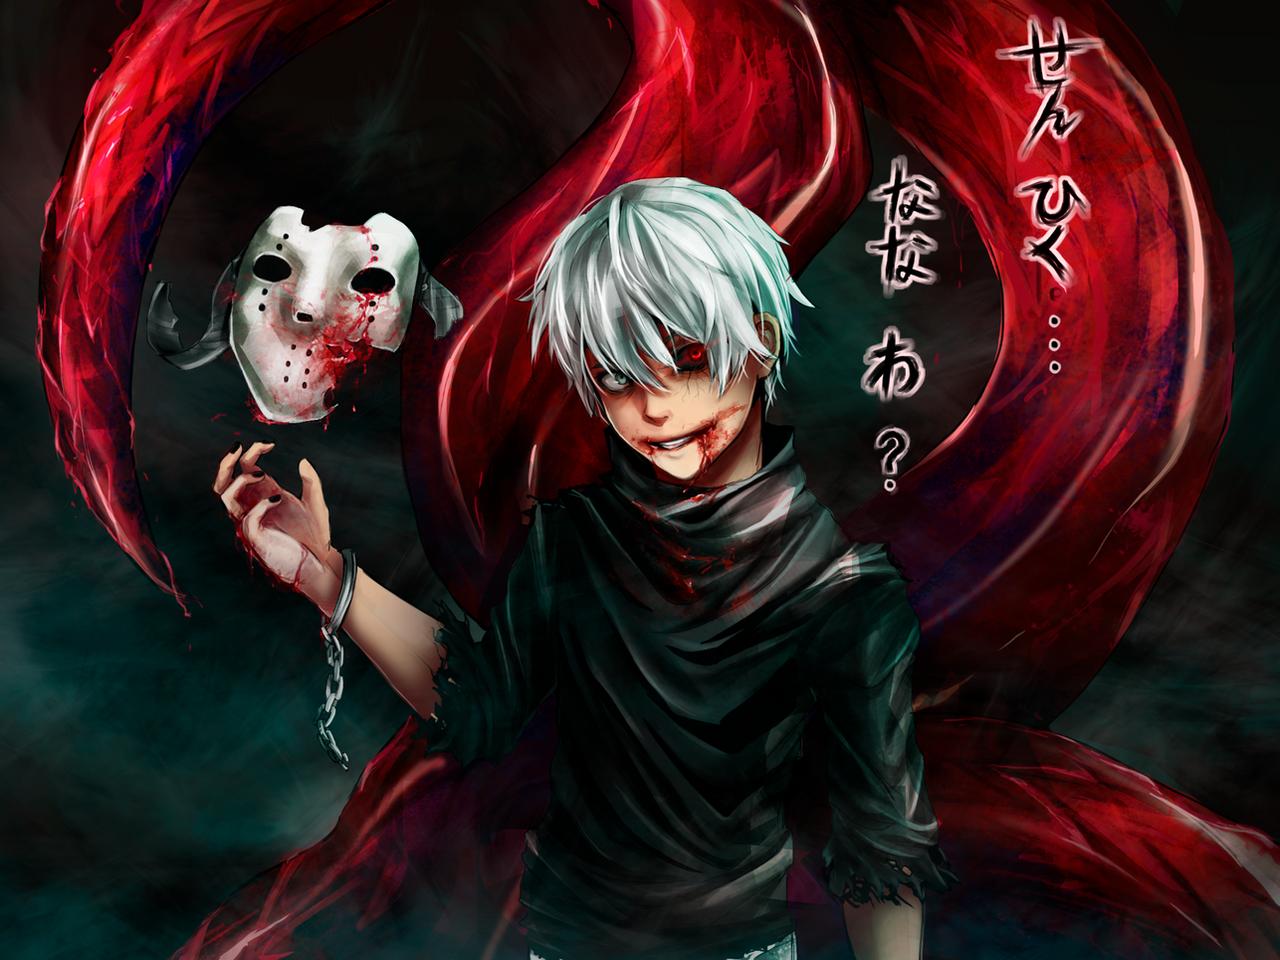 tokyo ghoul season 2 episode 1 english dub